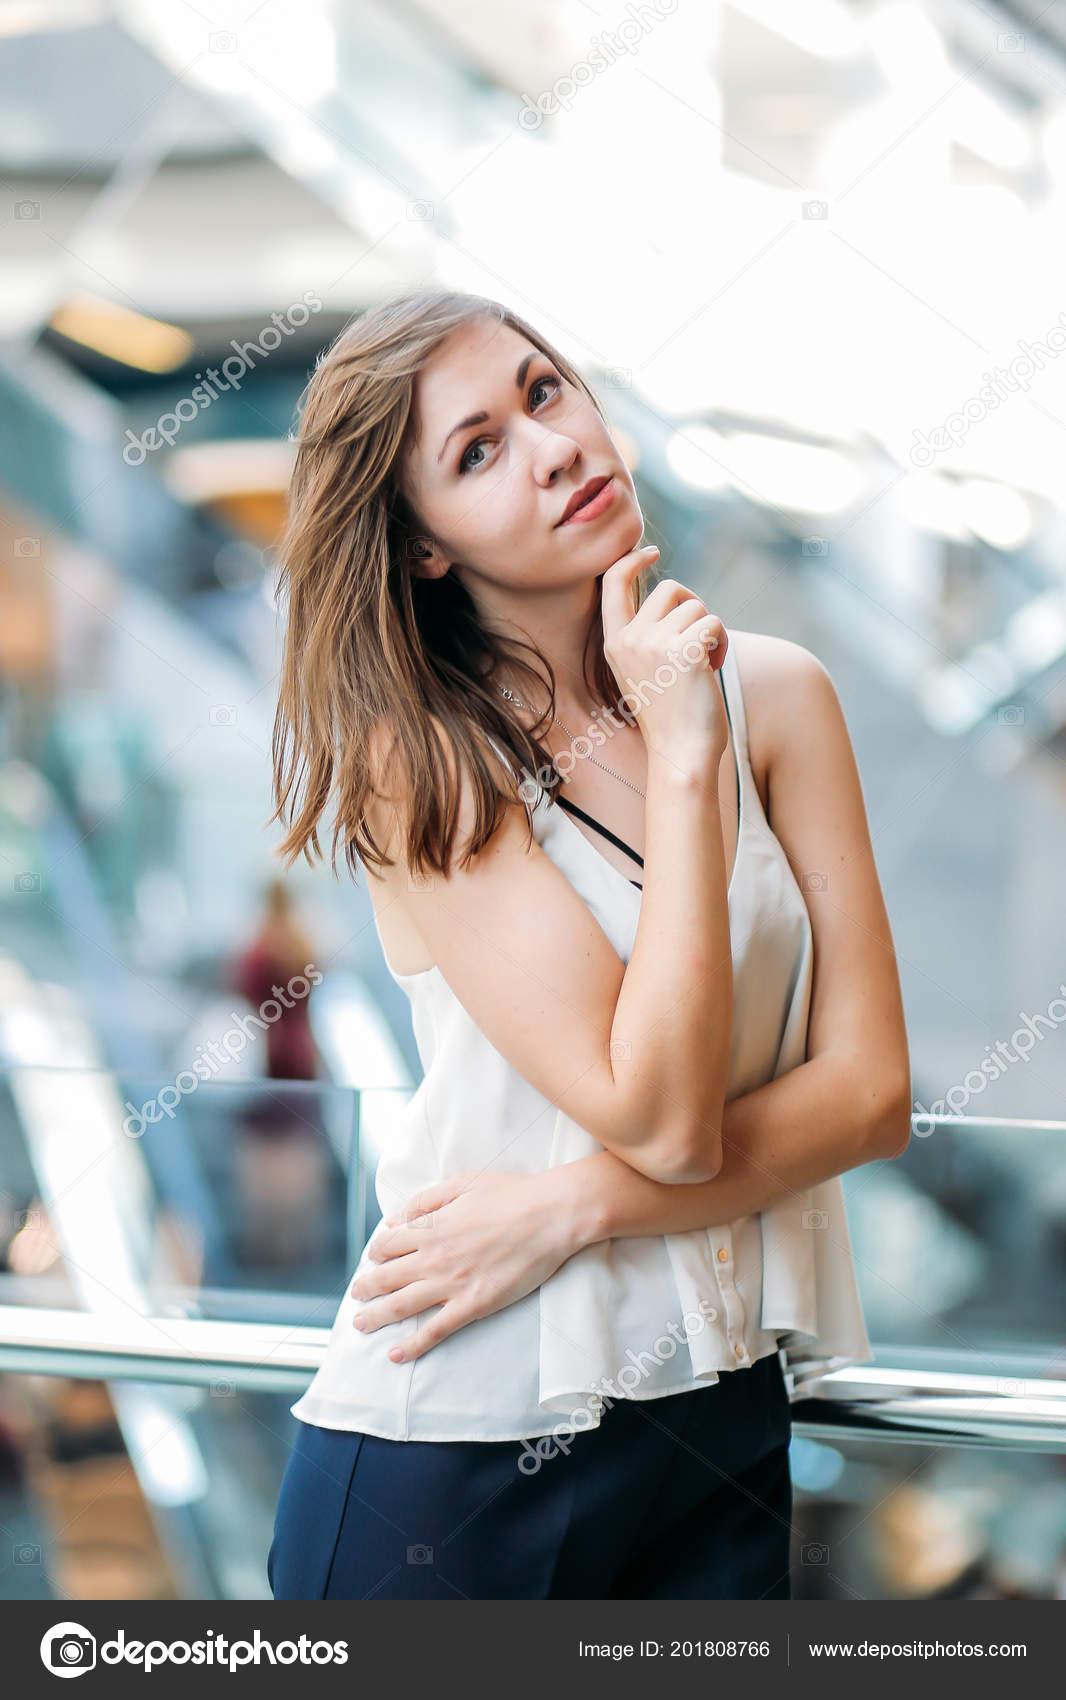 Stylish Model Posing Blurred Shopping Centre Background